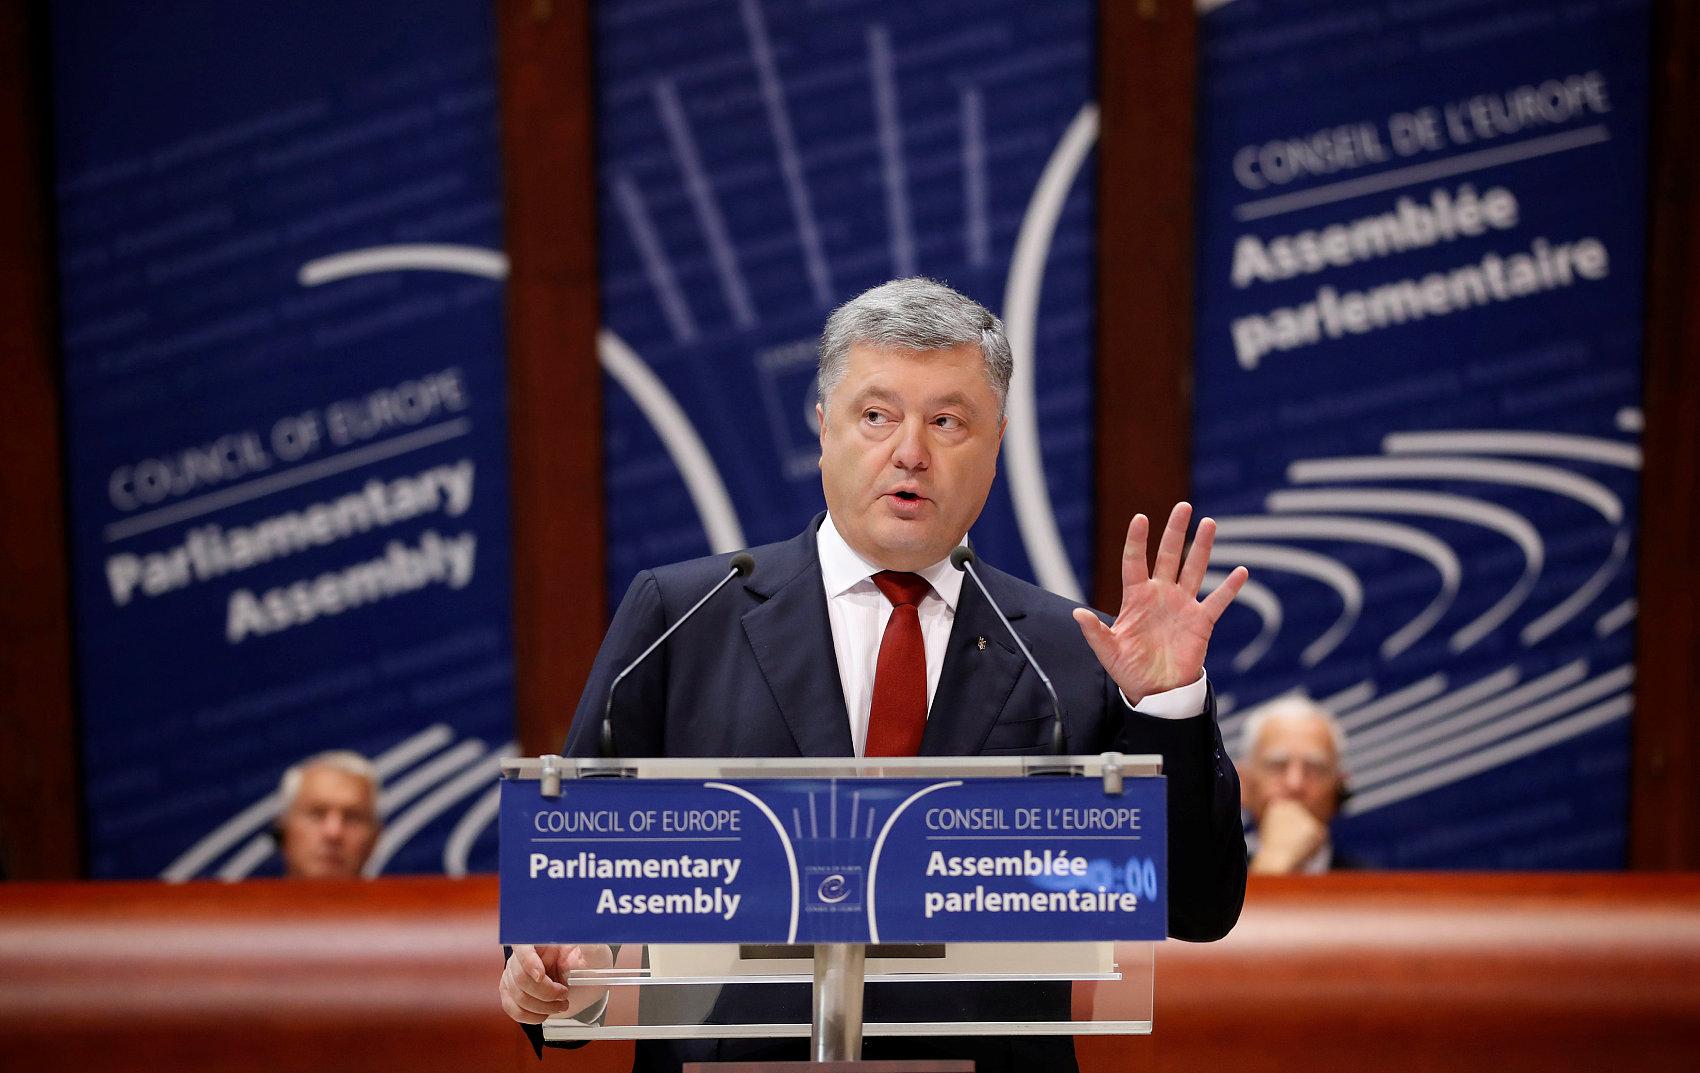 Worst period for economy over: Ukrainian president